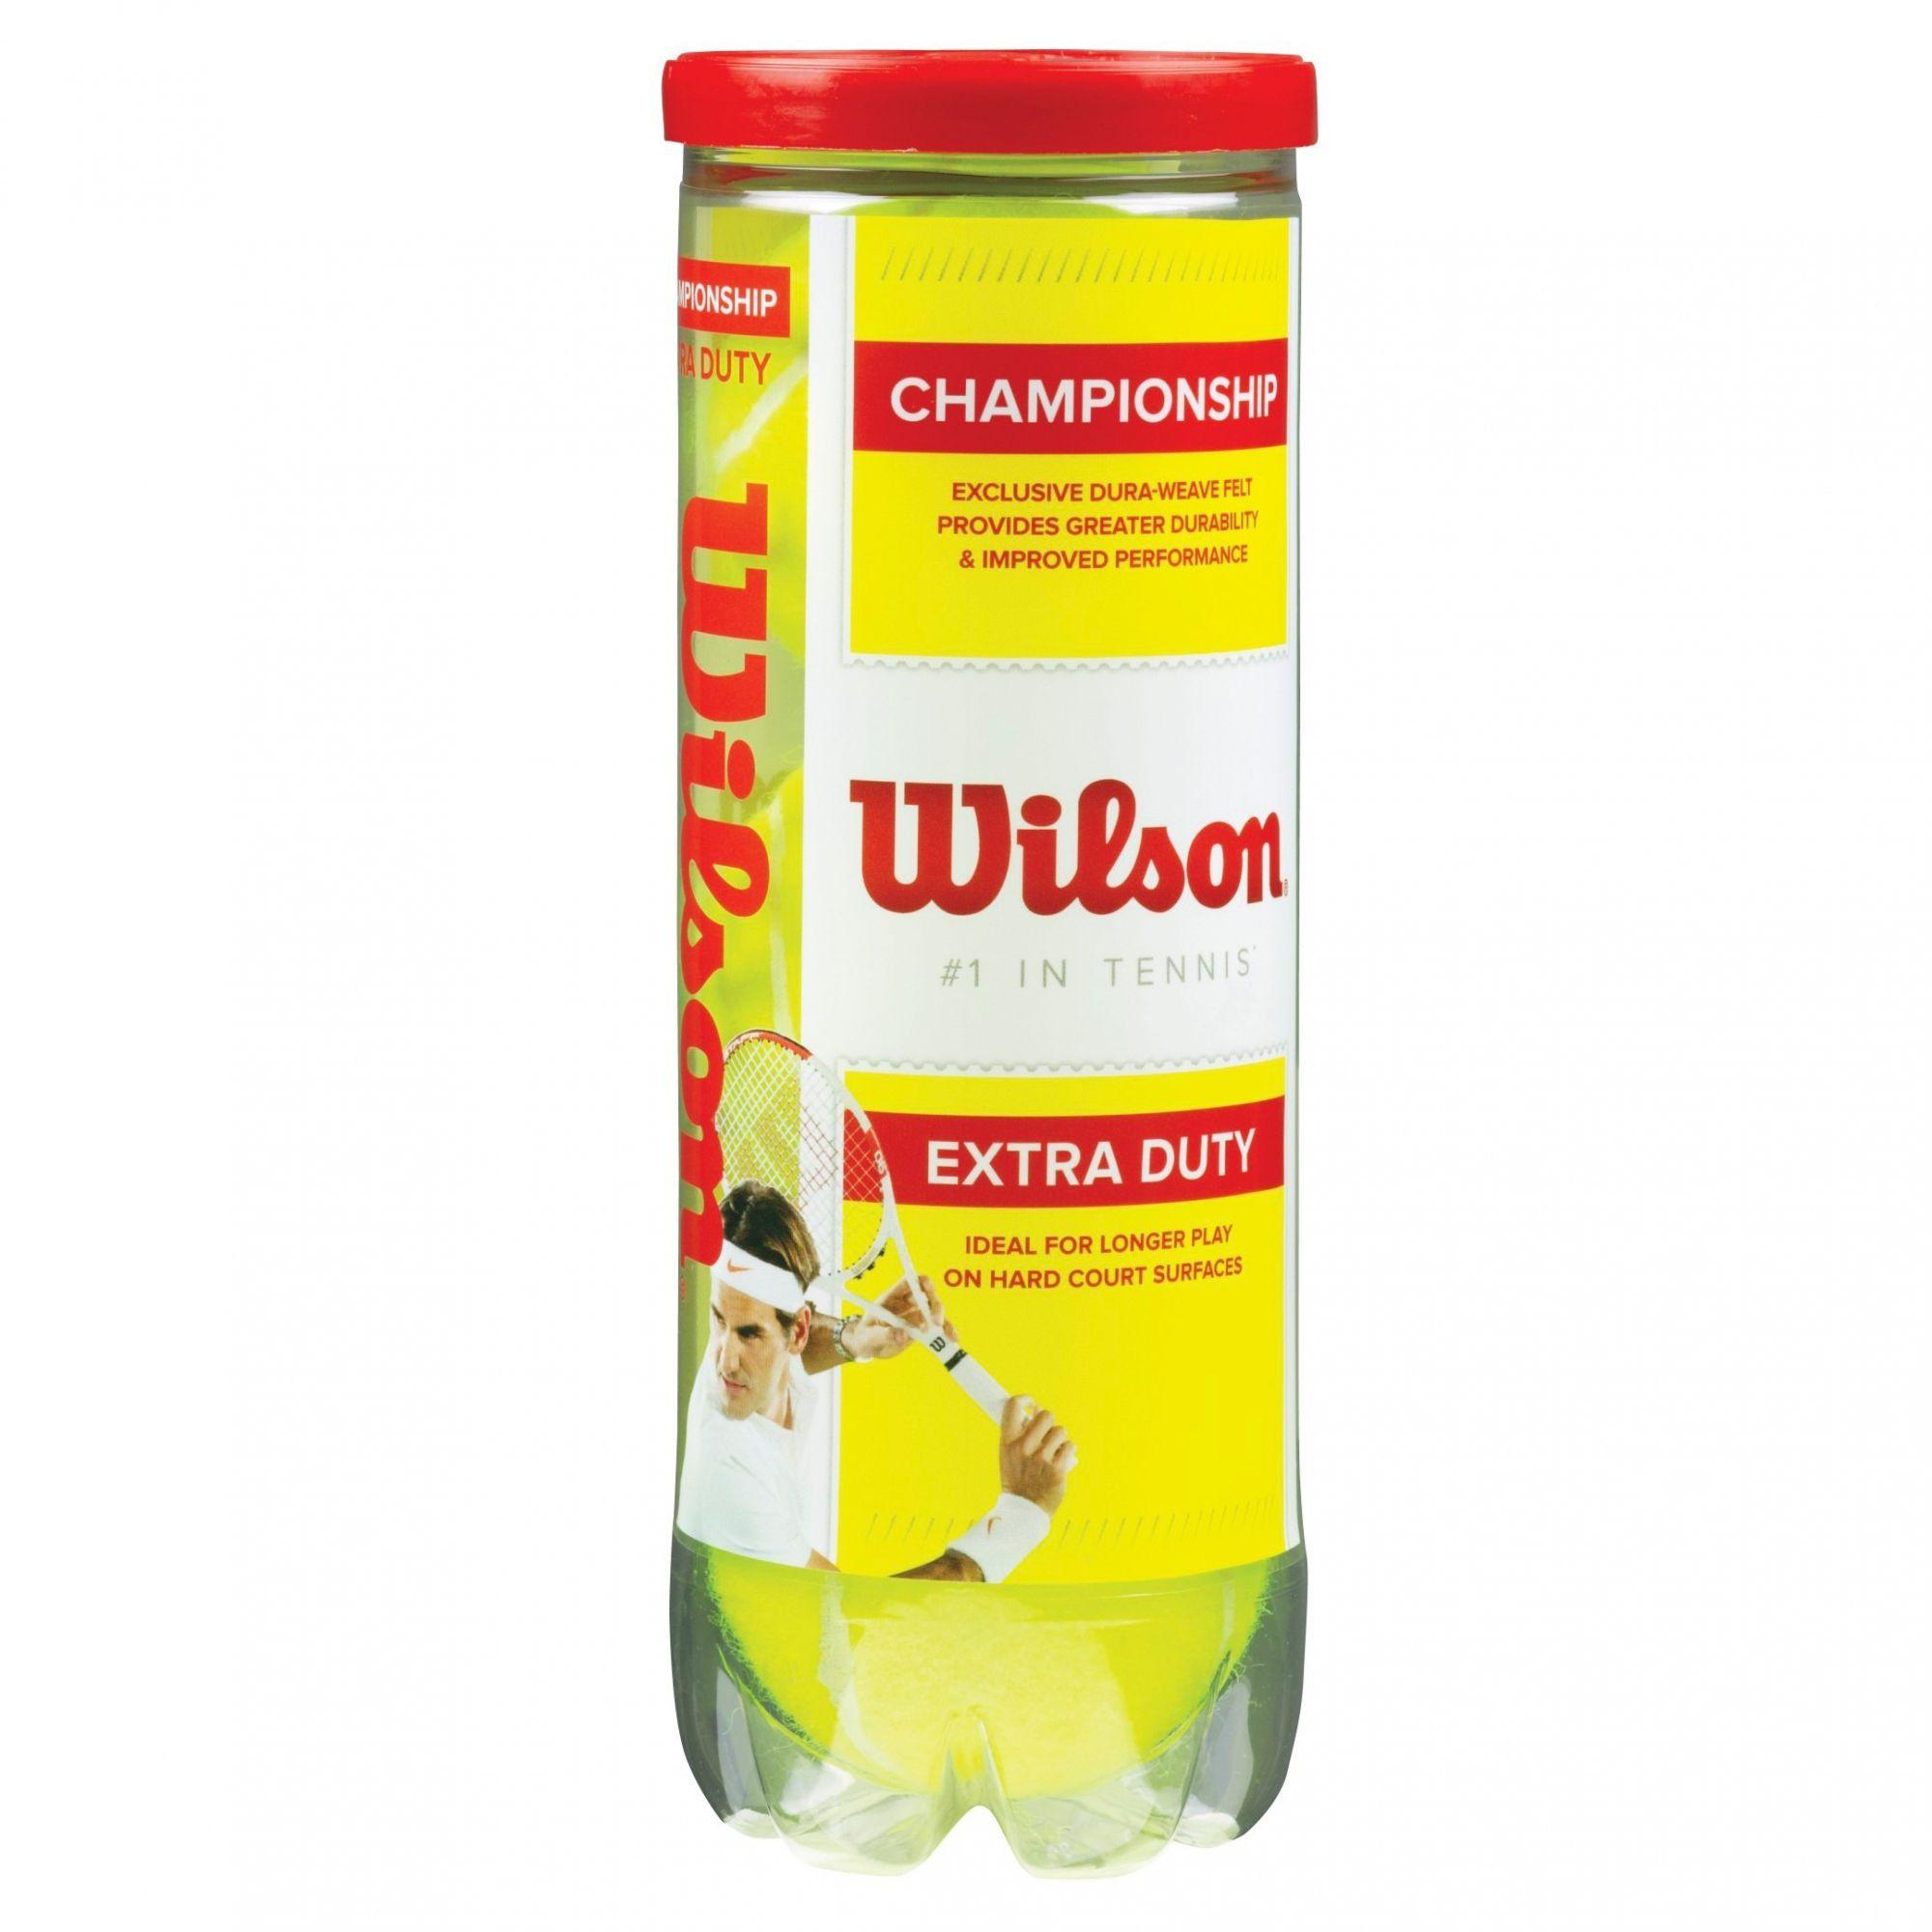 Bola de Tênis Wilson Championship WRT1001P